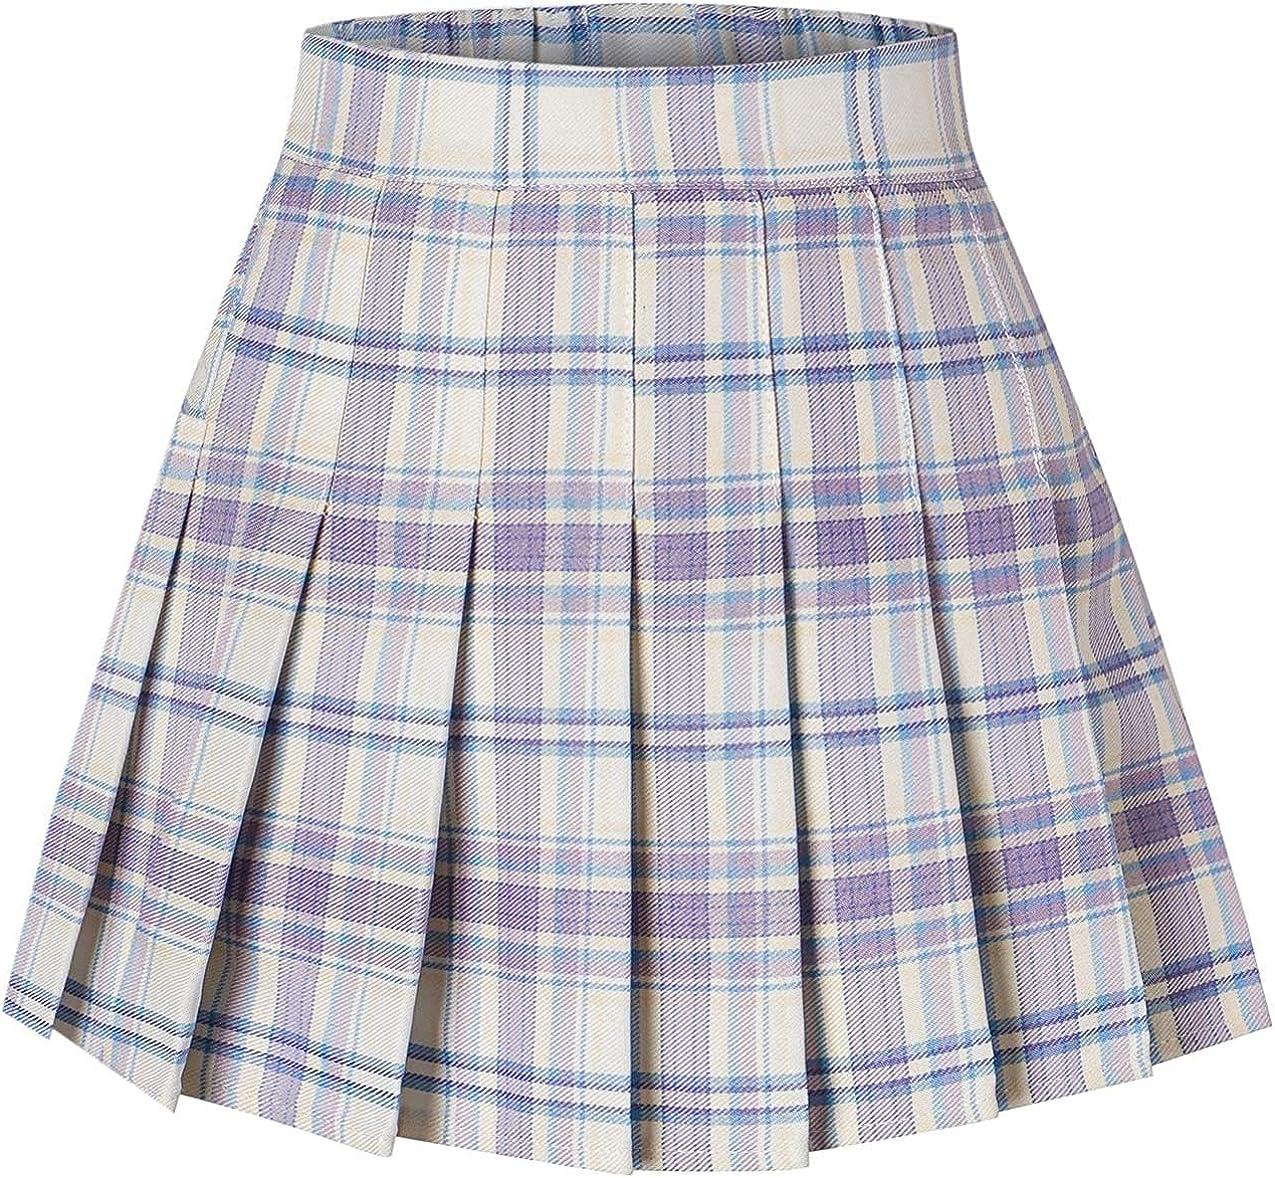 Girls & Women's Plaid Print Pleated School Uniform Skirt Lilac Plaid, US X-Large